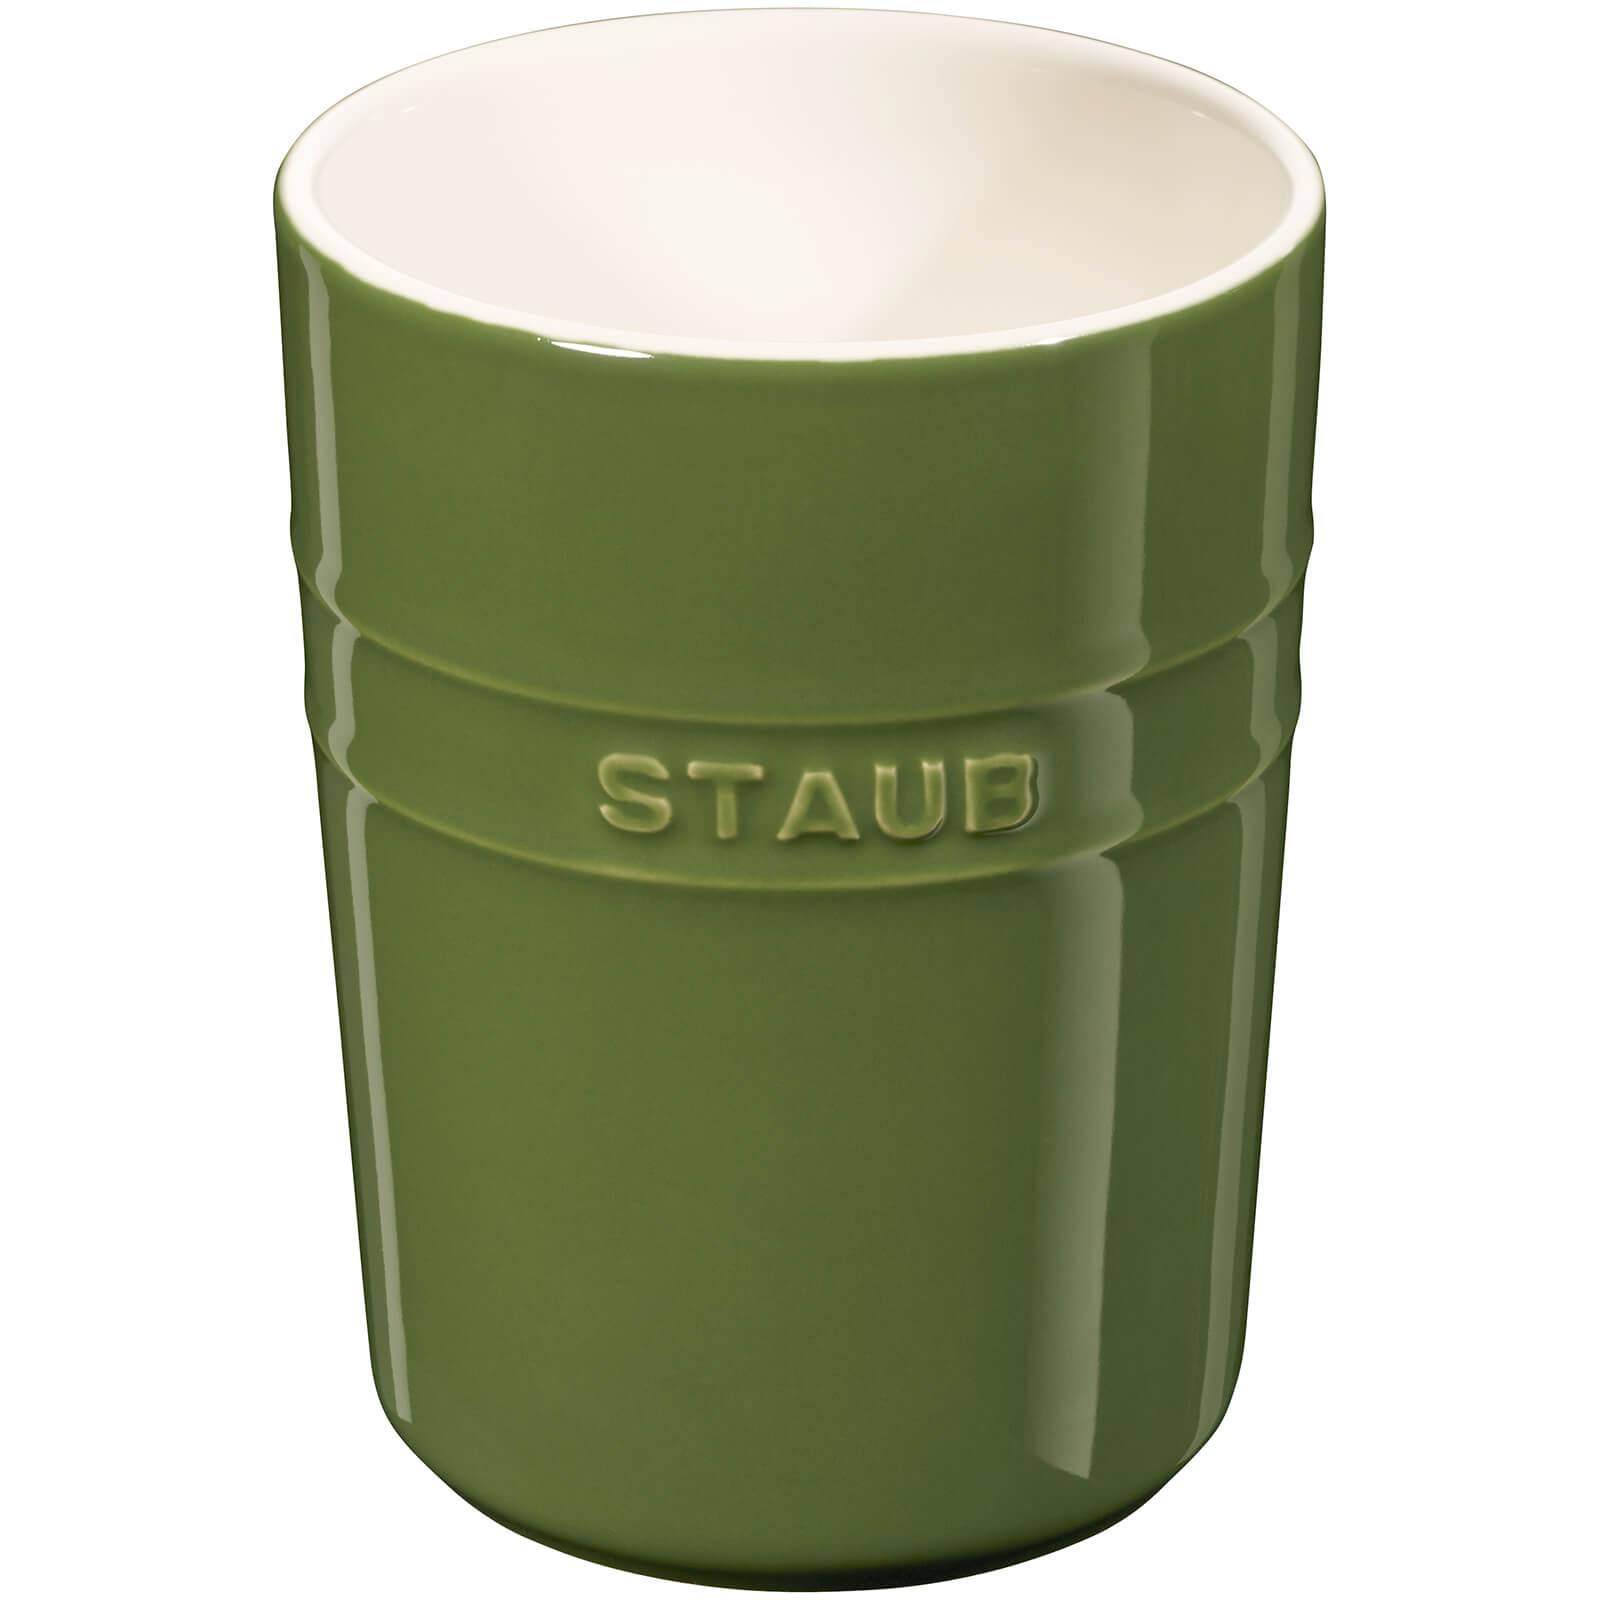 Staub Ceramic Round Utensil Holder - Basil